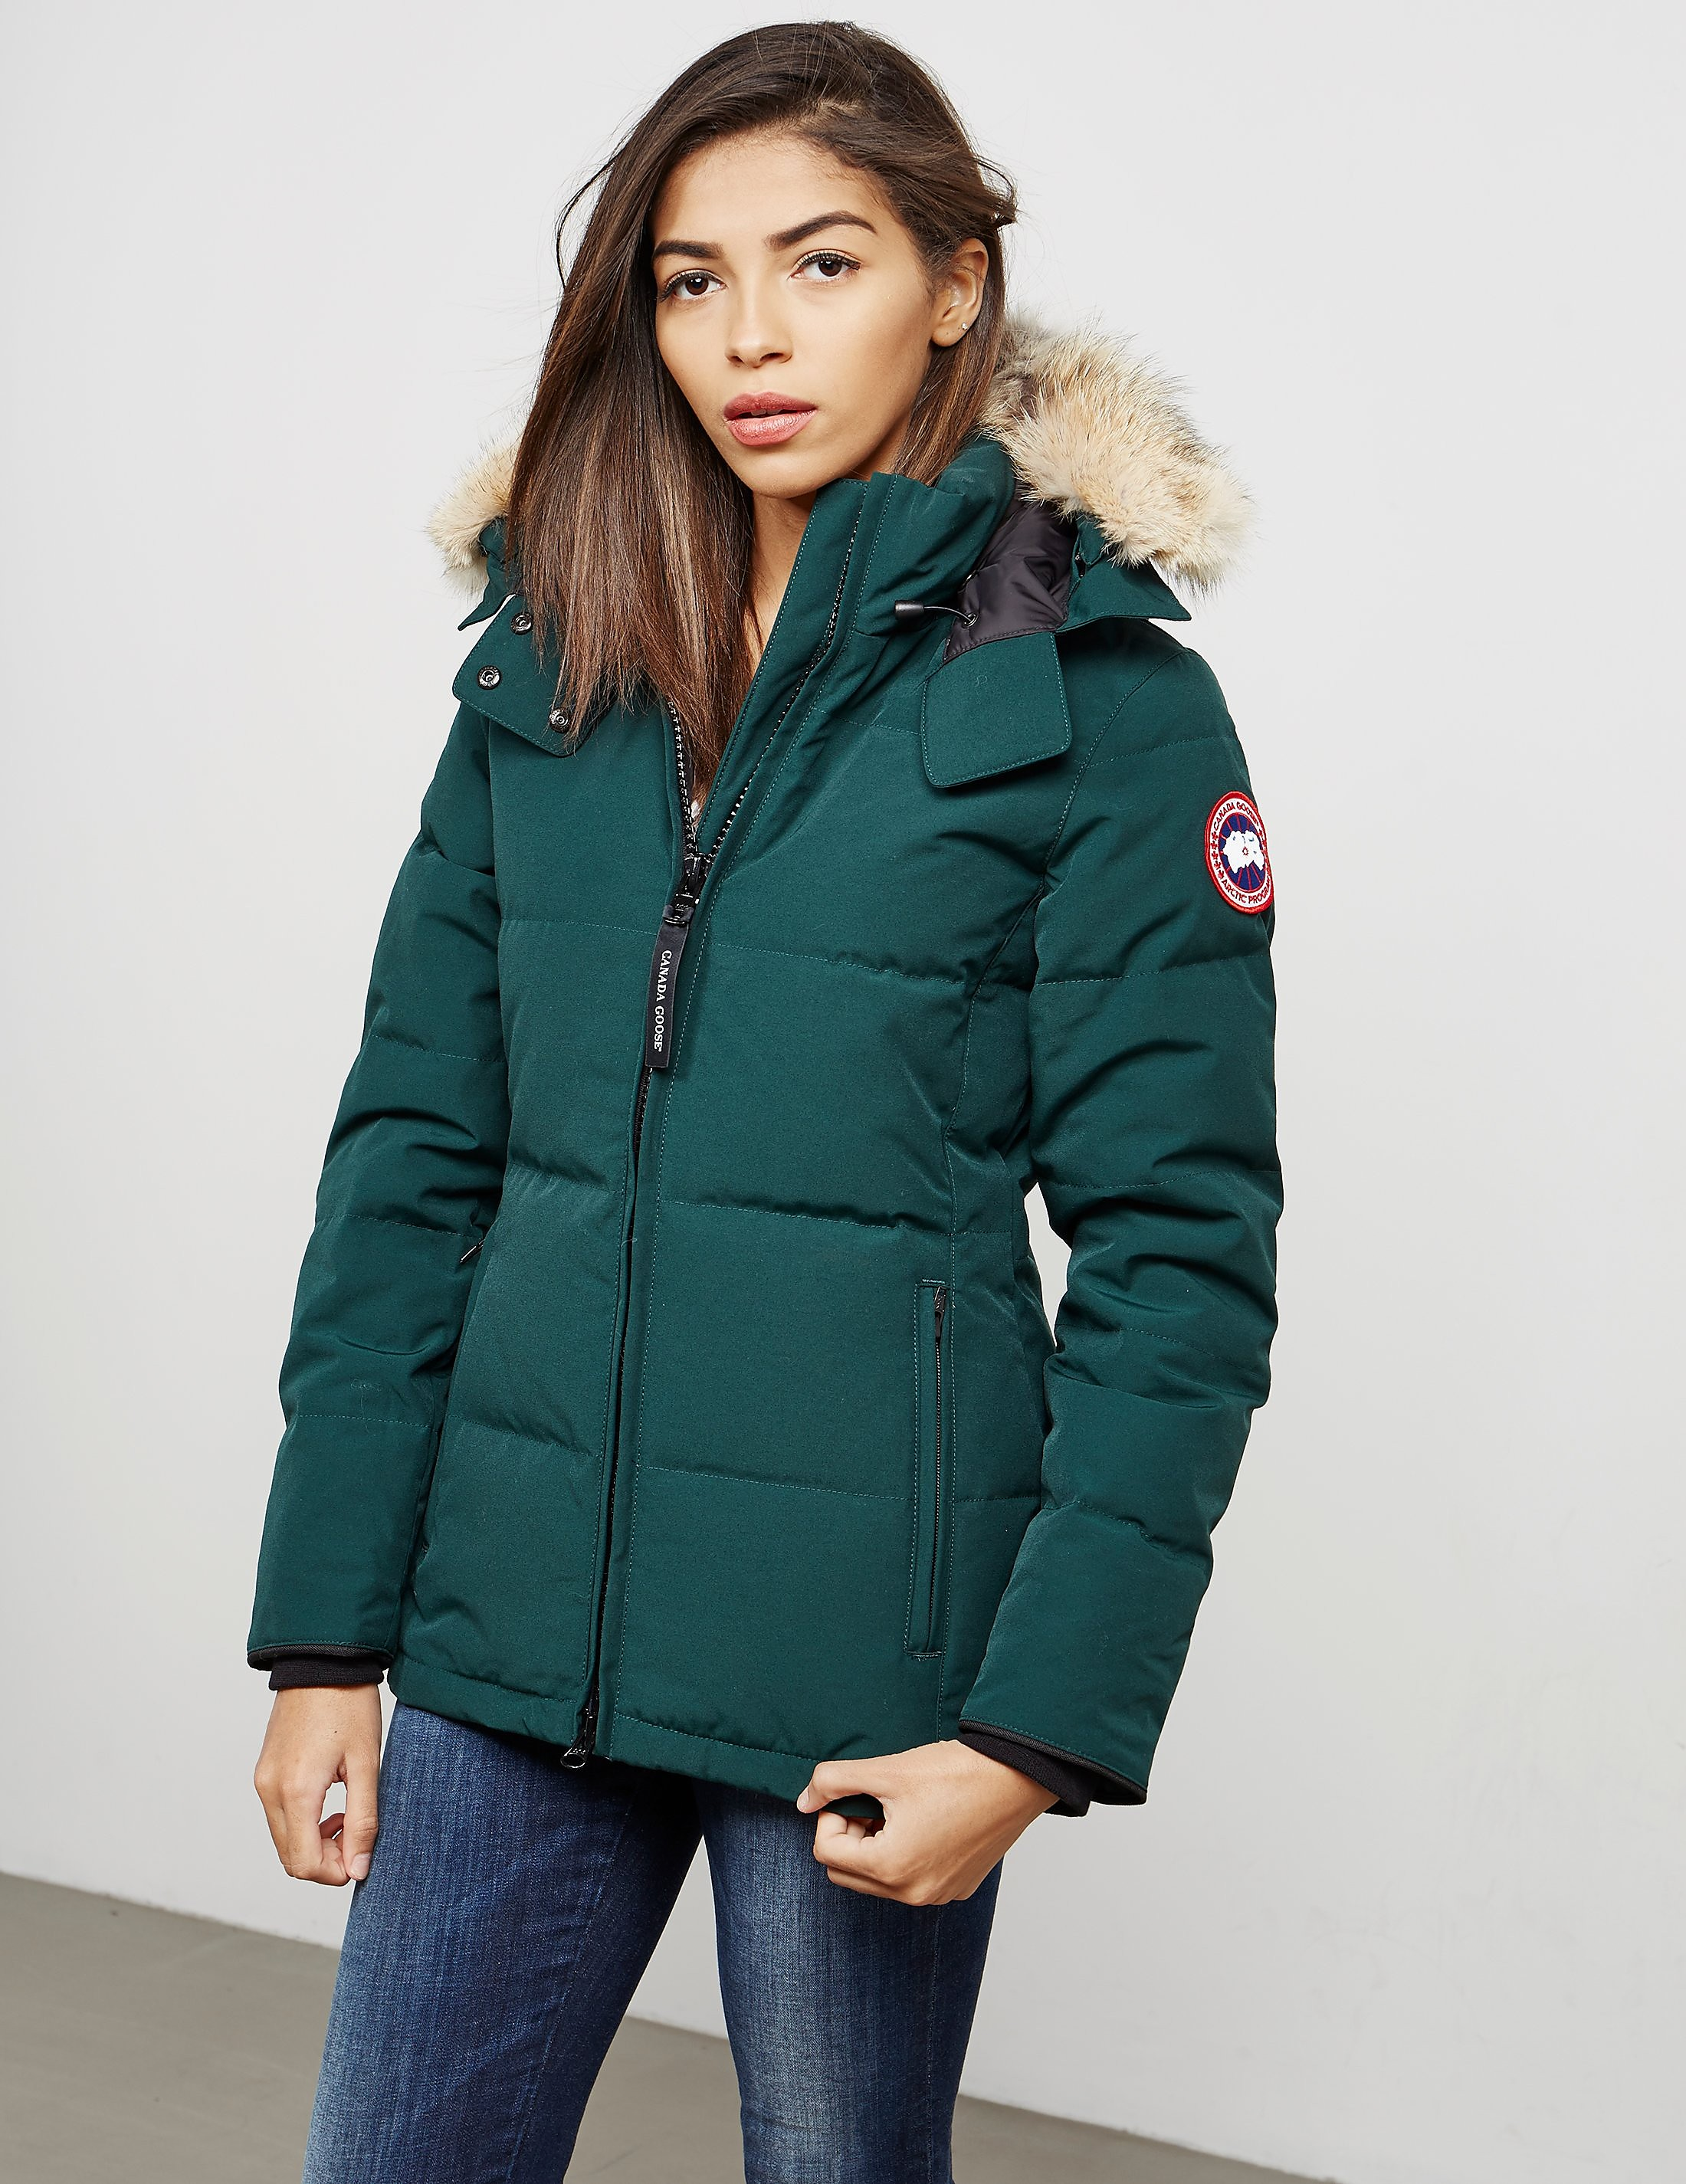 Canada Goose Chelsea Padded Parka Jacket